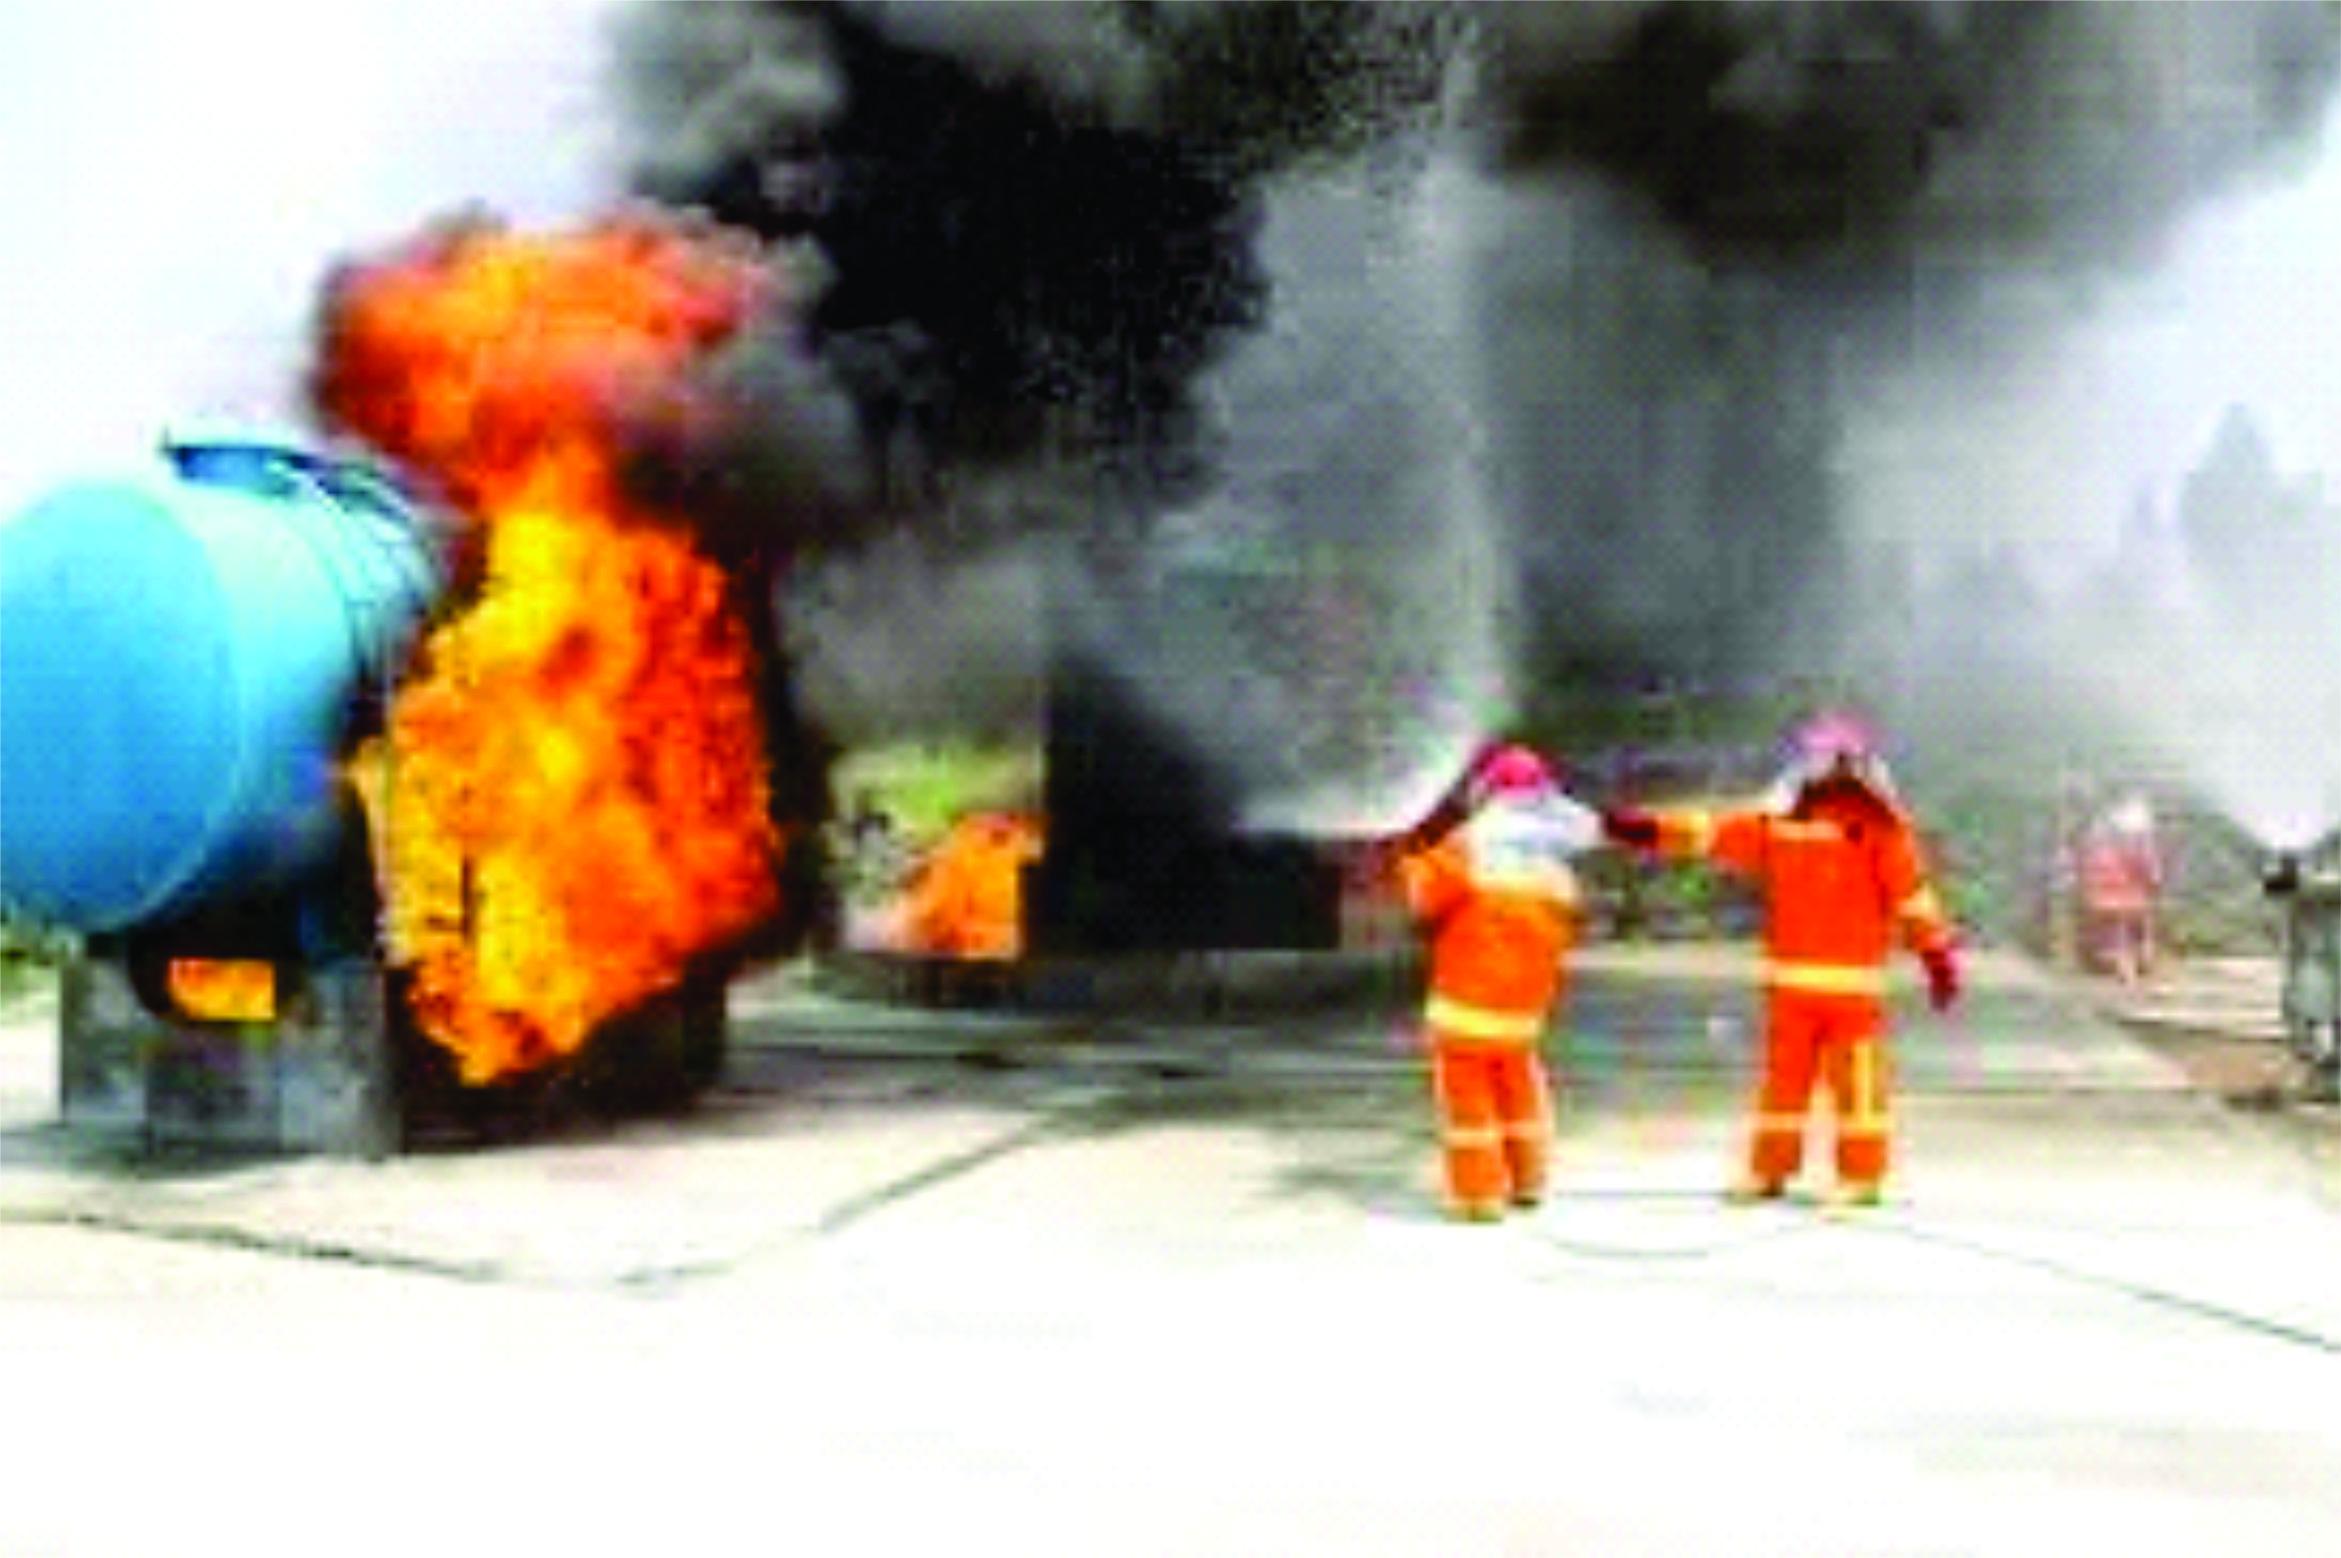 Perusahaan Penyedia Training Pemadam Kebakaran di Bandung